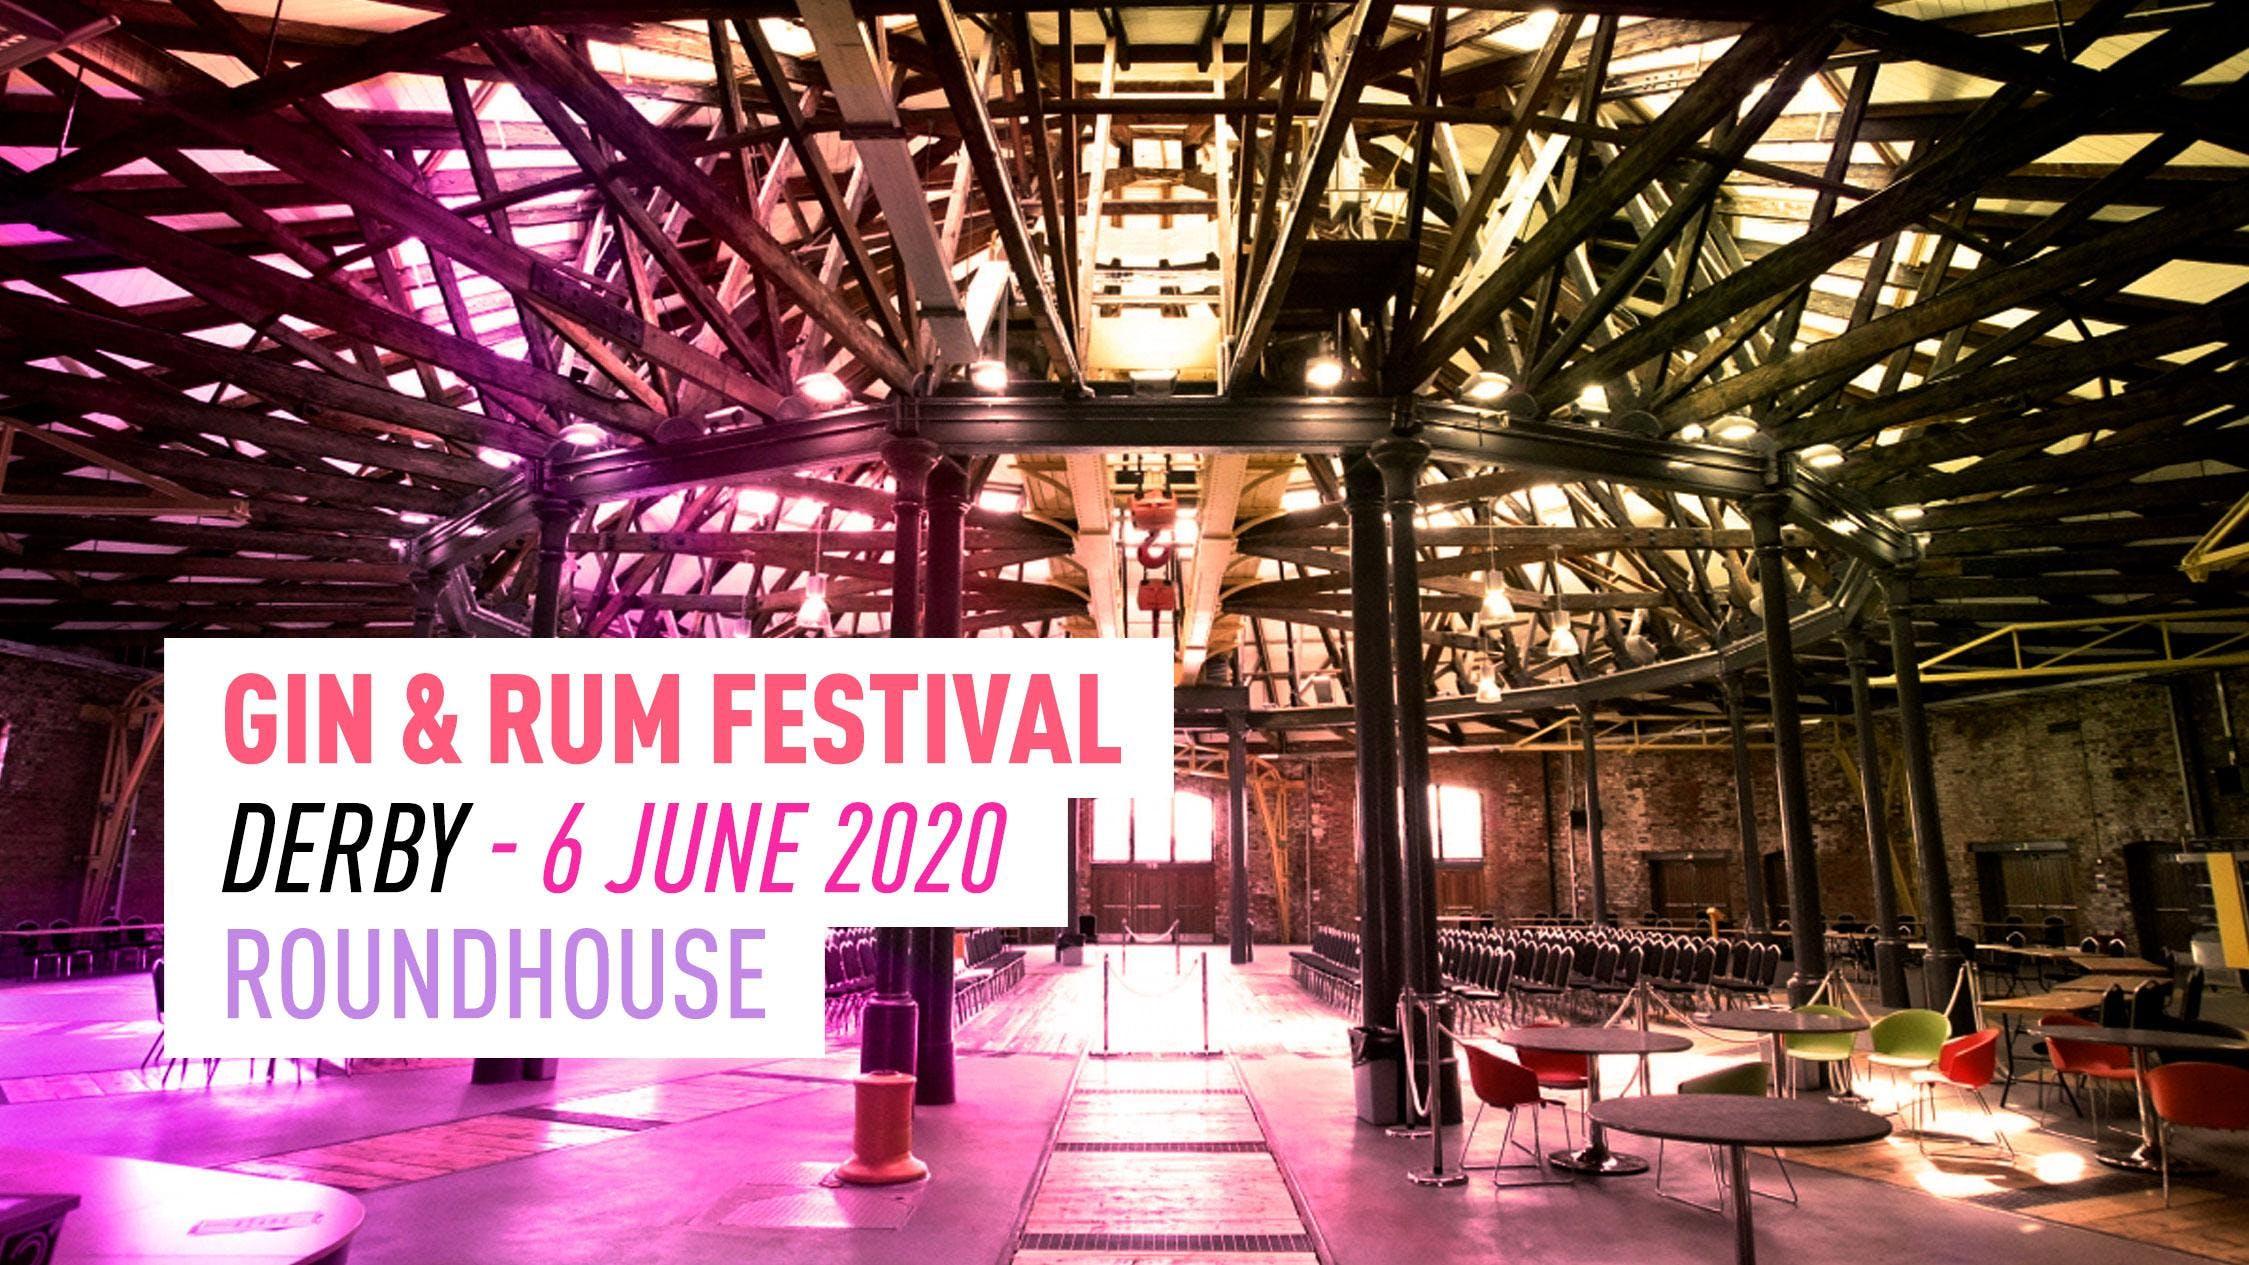 Derby Festival 2020.The Gin Rum Festival Derby 2020